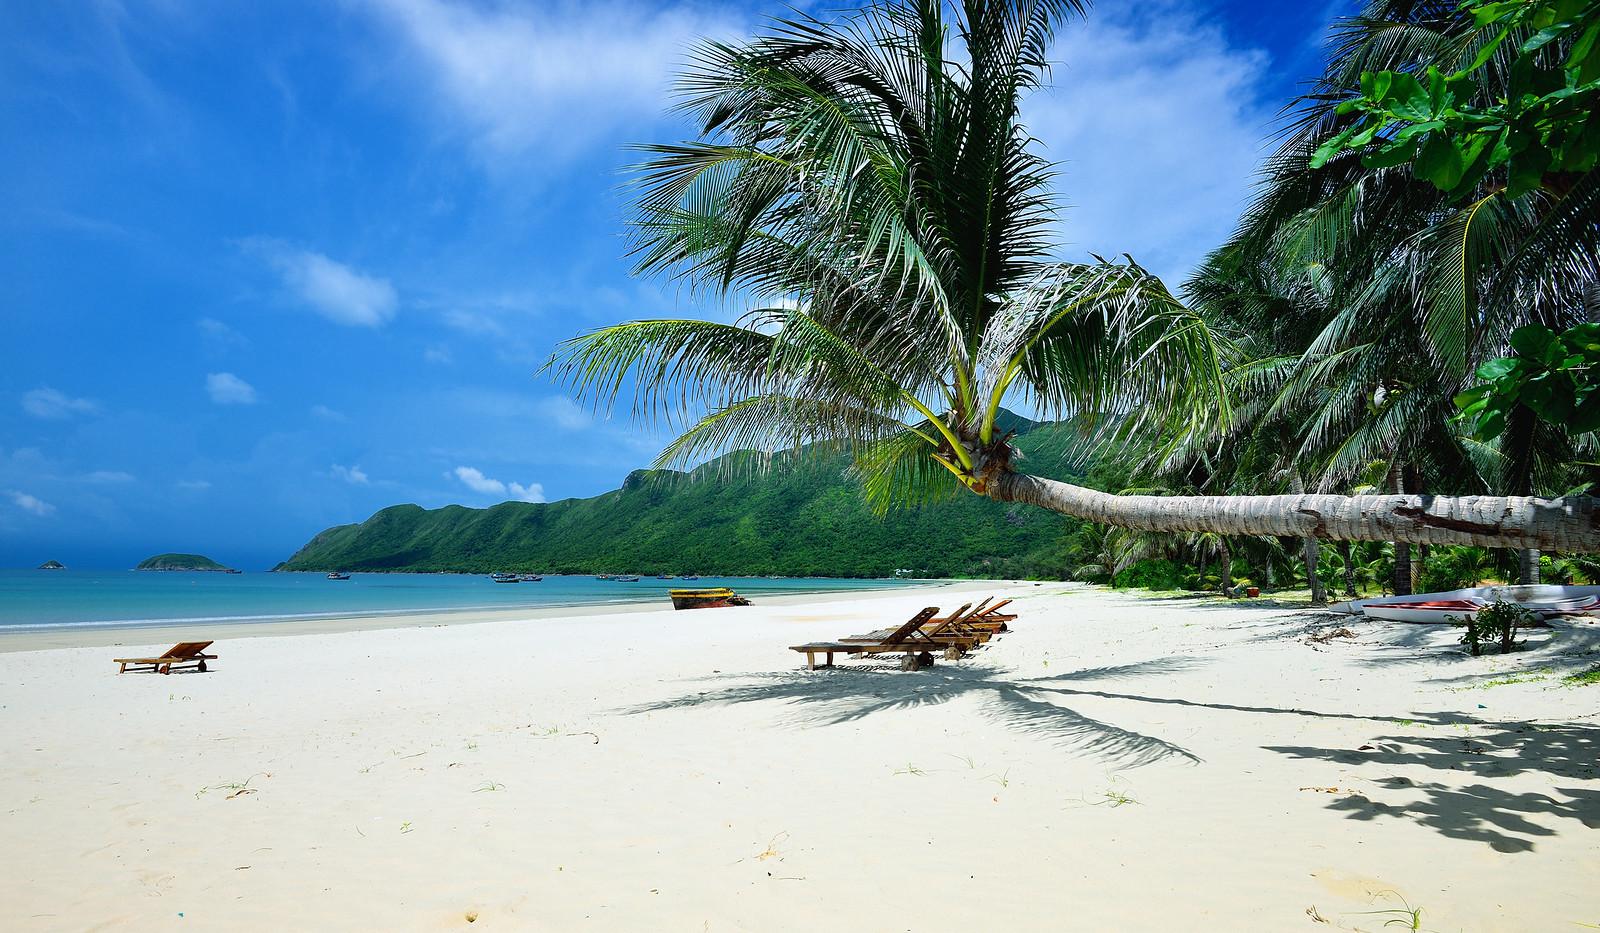 Beach in Côn Dao Vietnam